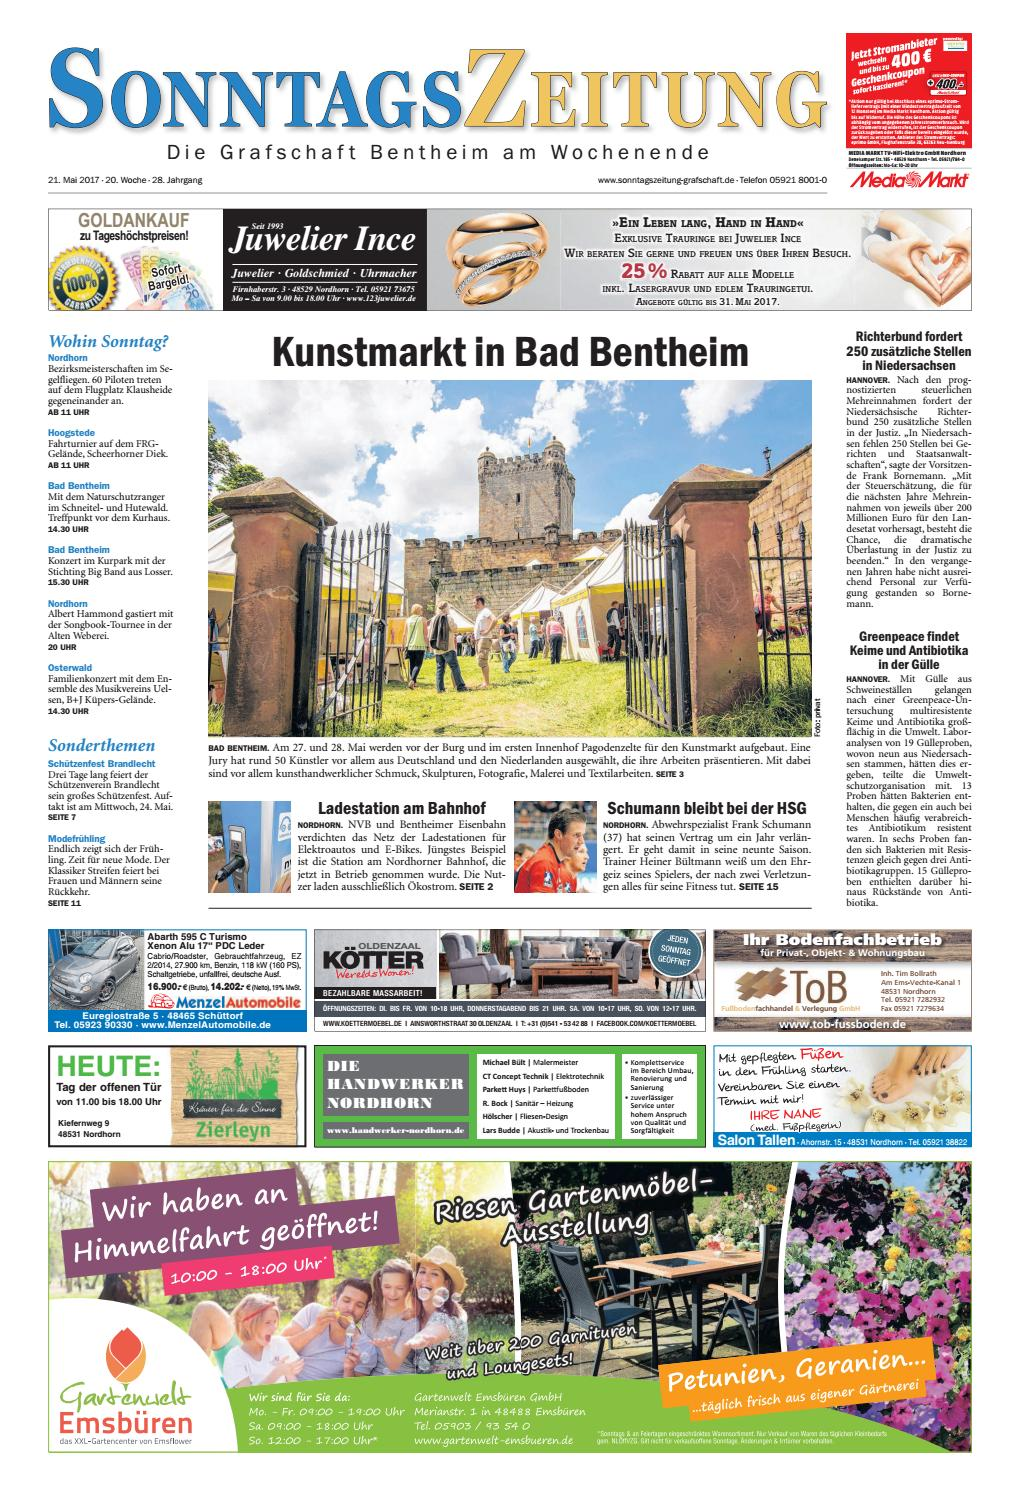 sonntagszeitung 21 05 2017 by sonntagszeitung issuu. Black Bedroom Furniture Sets. Home Design Ideas